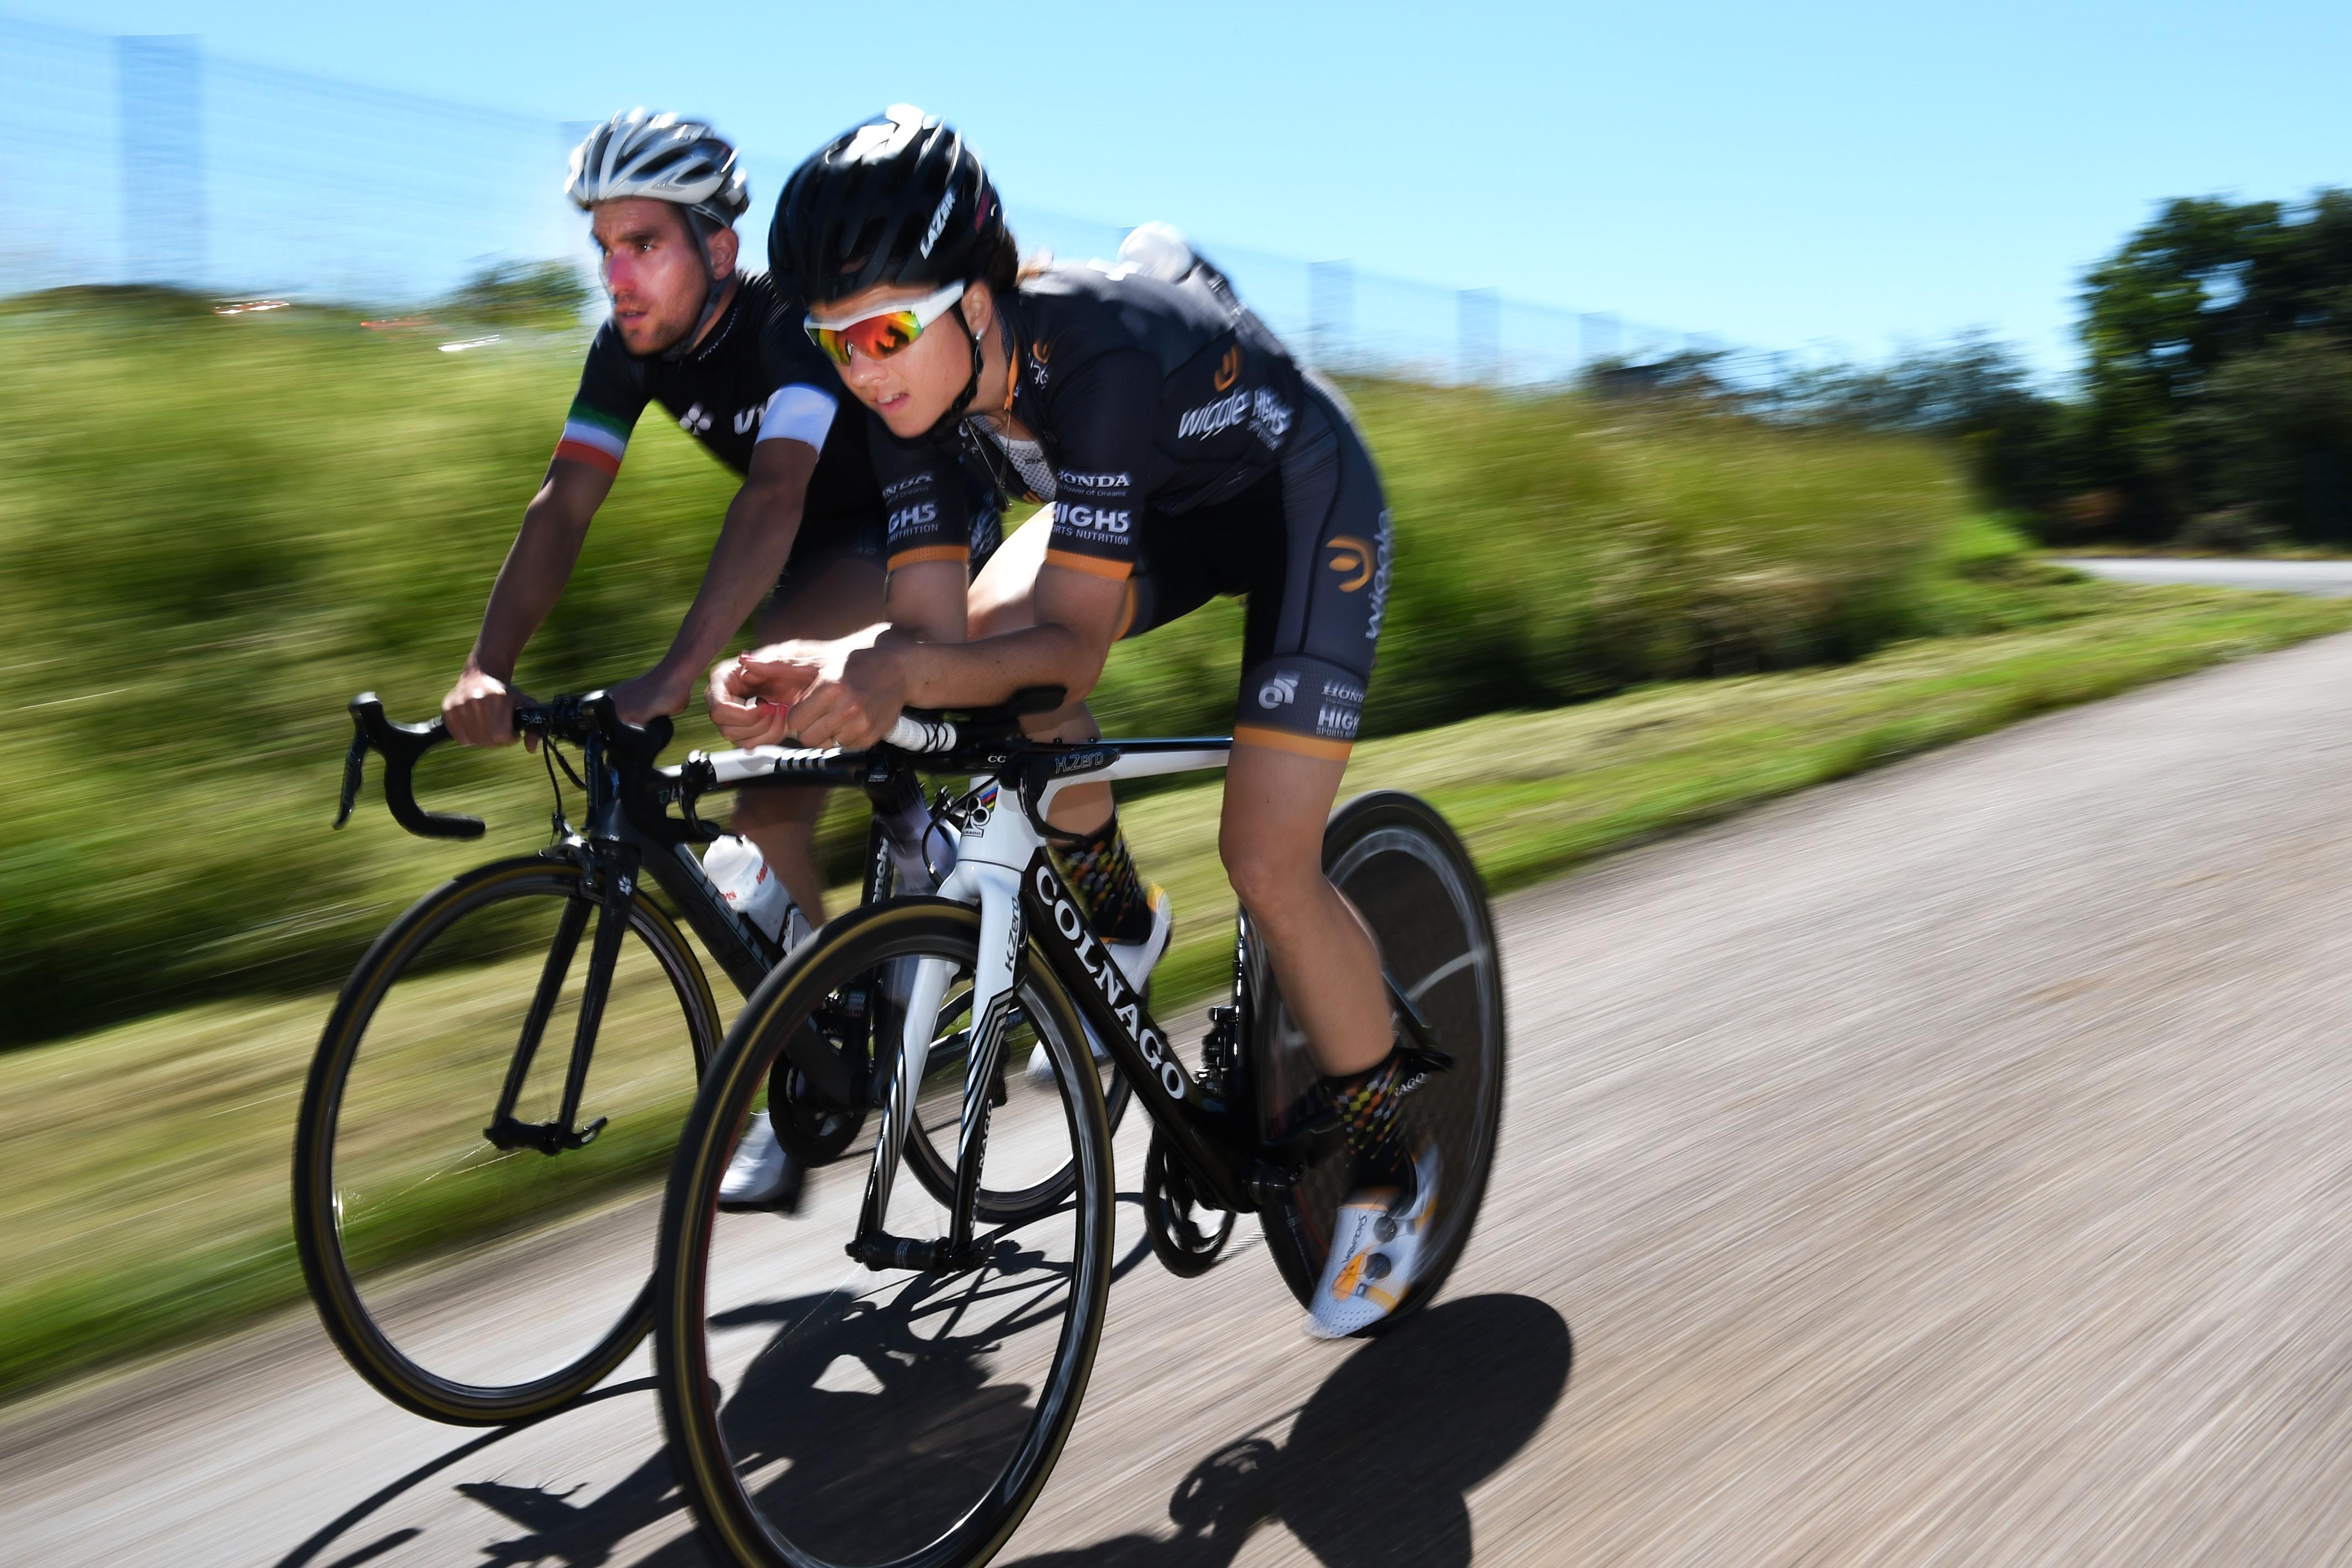 Audrey cordon, interview, JO 2016, JO RIo, JO Rio 2016, cyclisme, velo, cyclisme feminin, championne de france, honda, wiggle honda